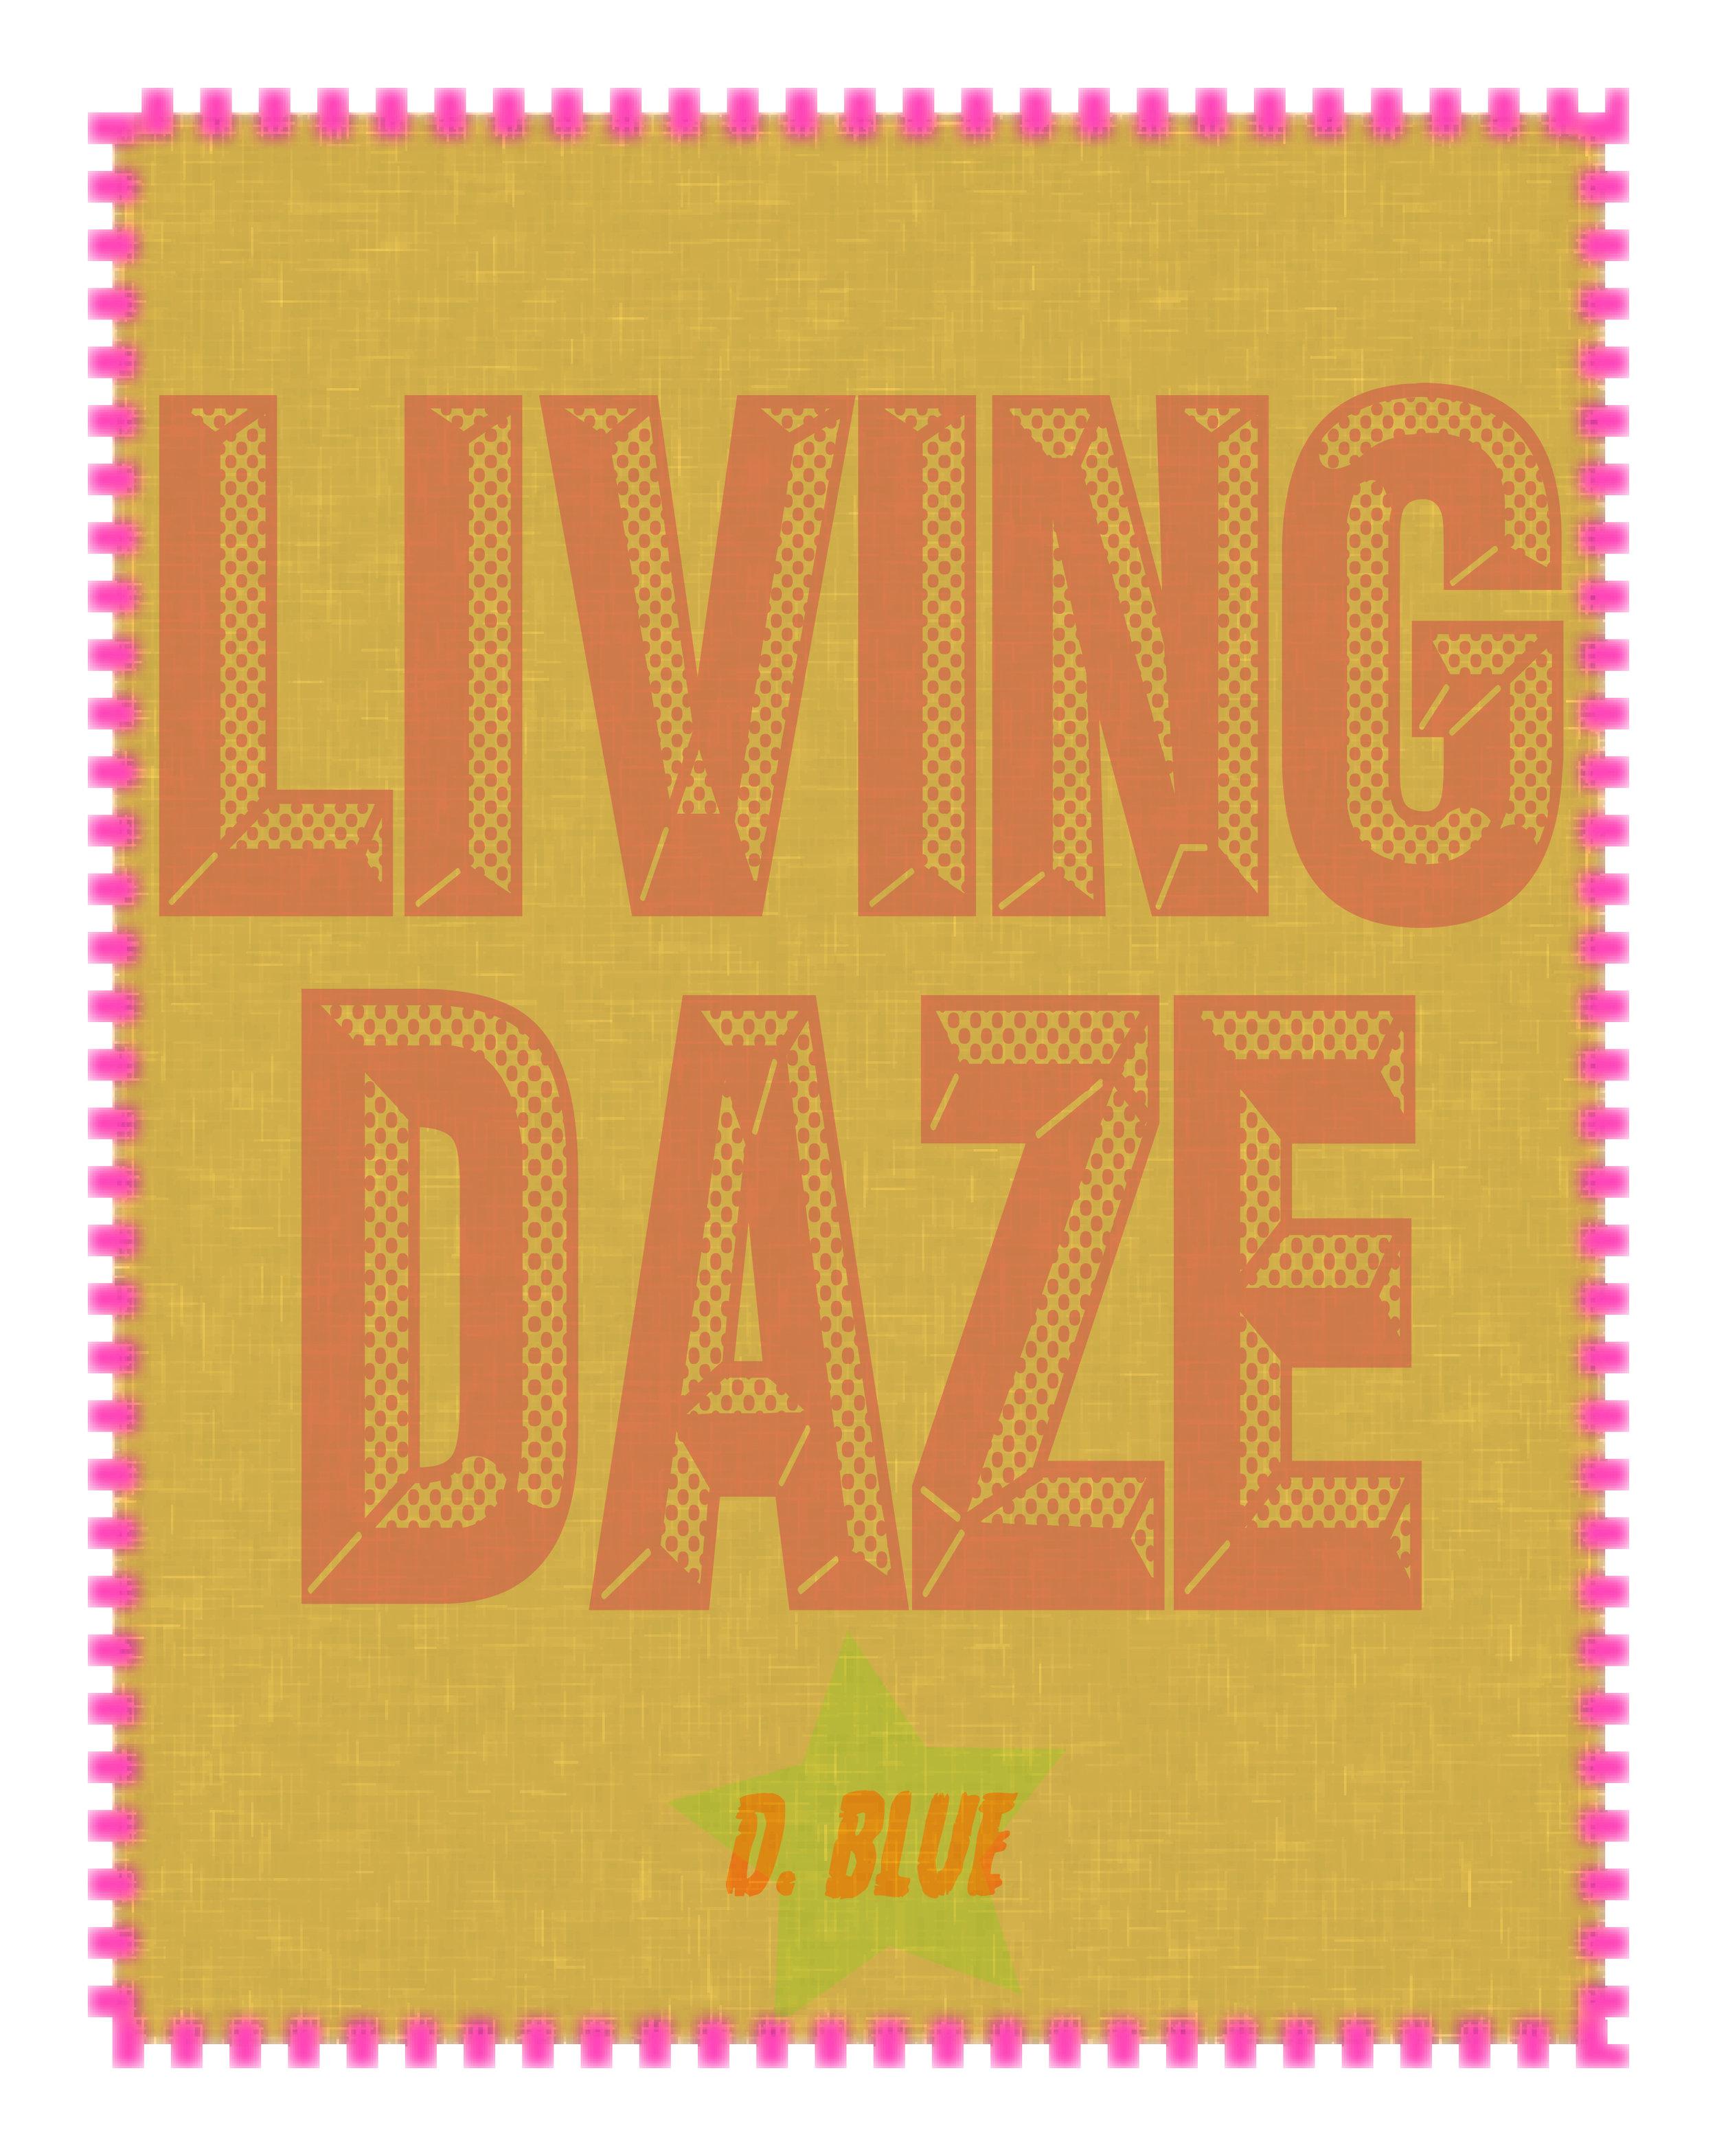 livingliving1W3B4903.jpg